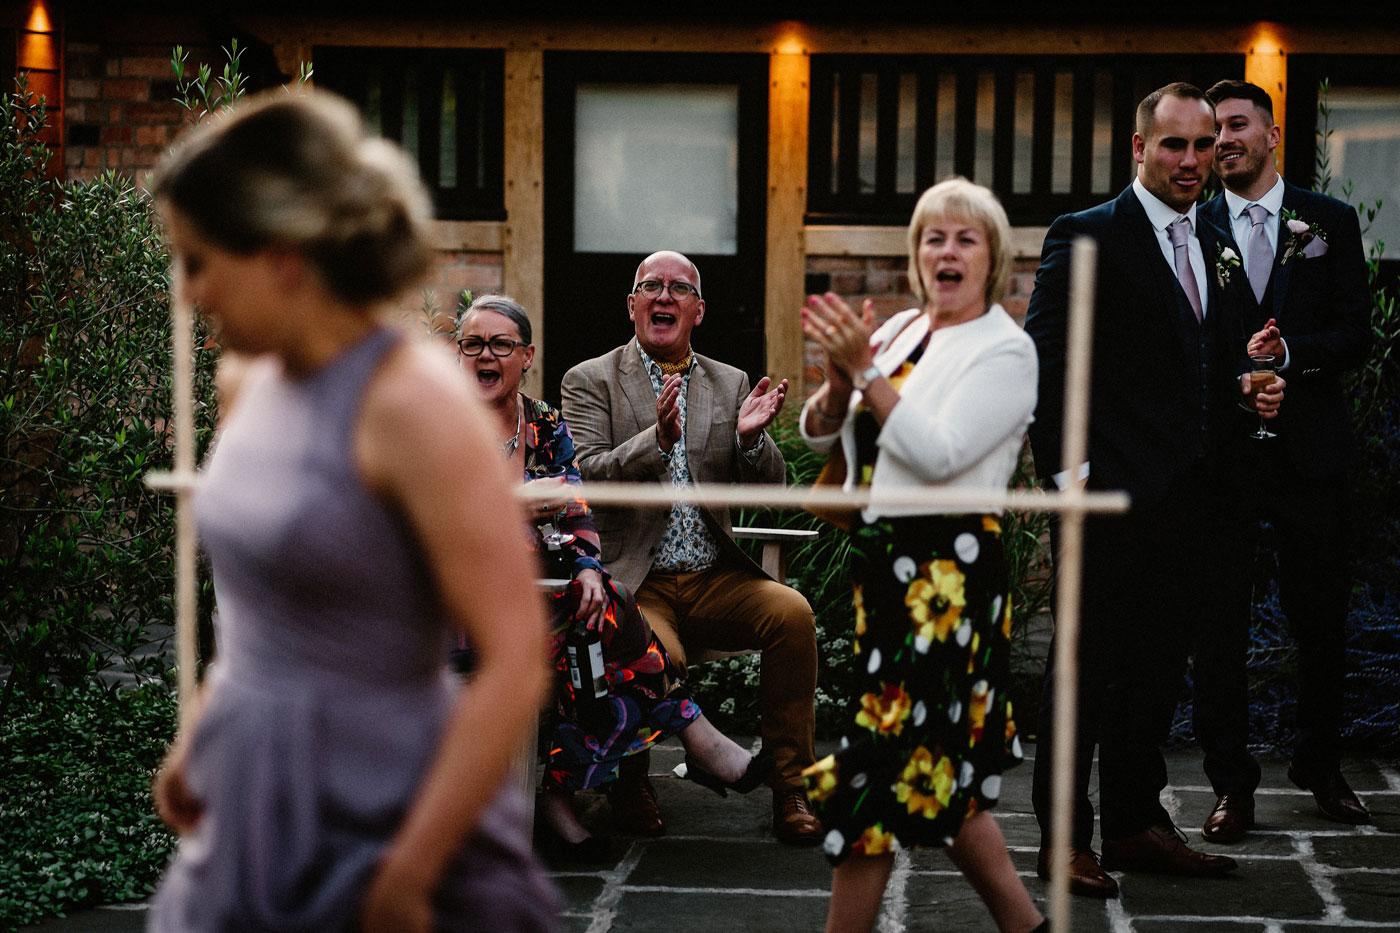 Barns and Yard Wedding